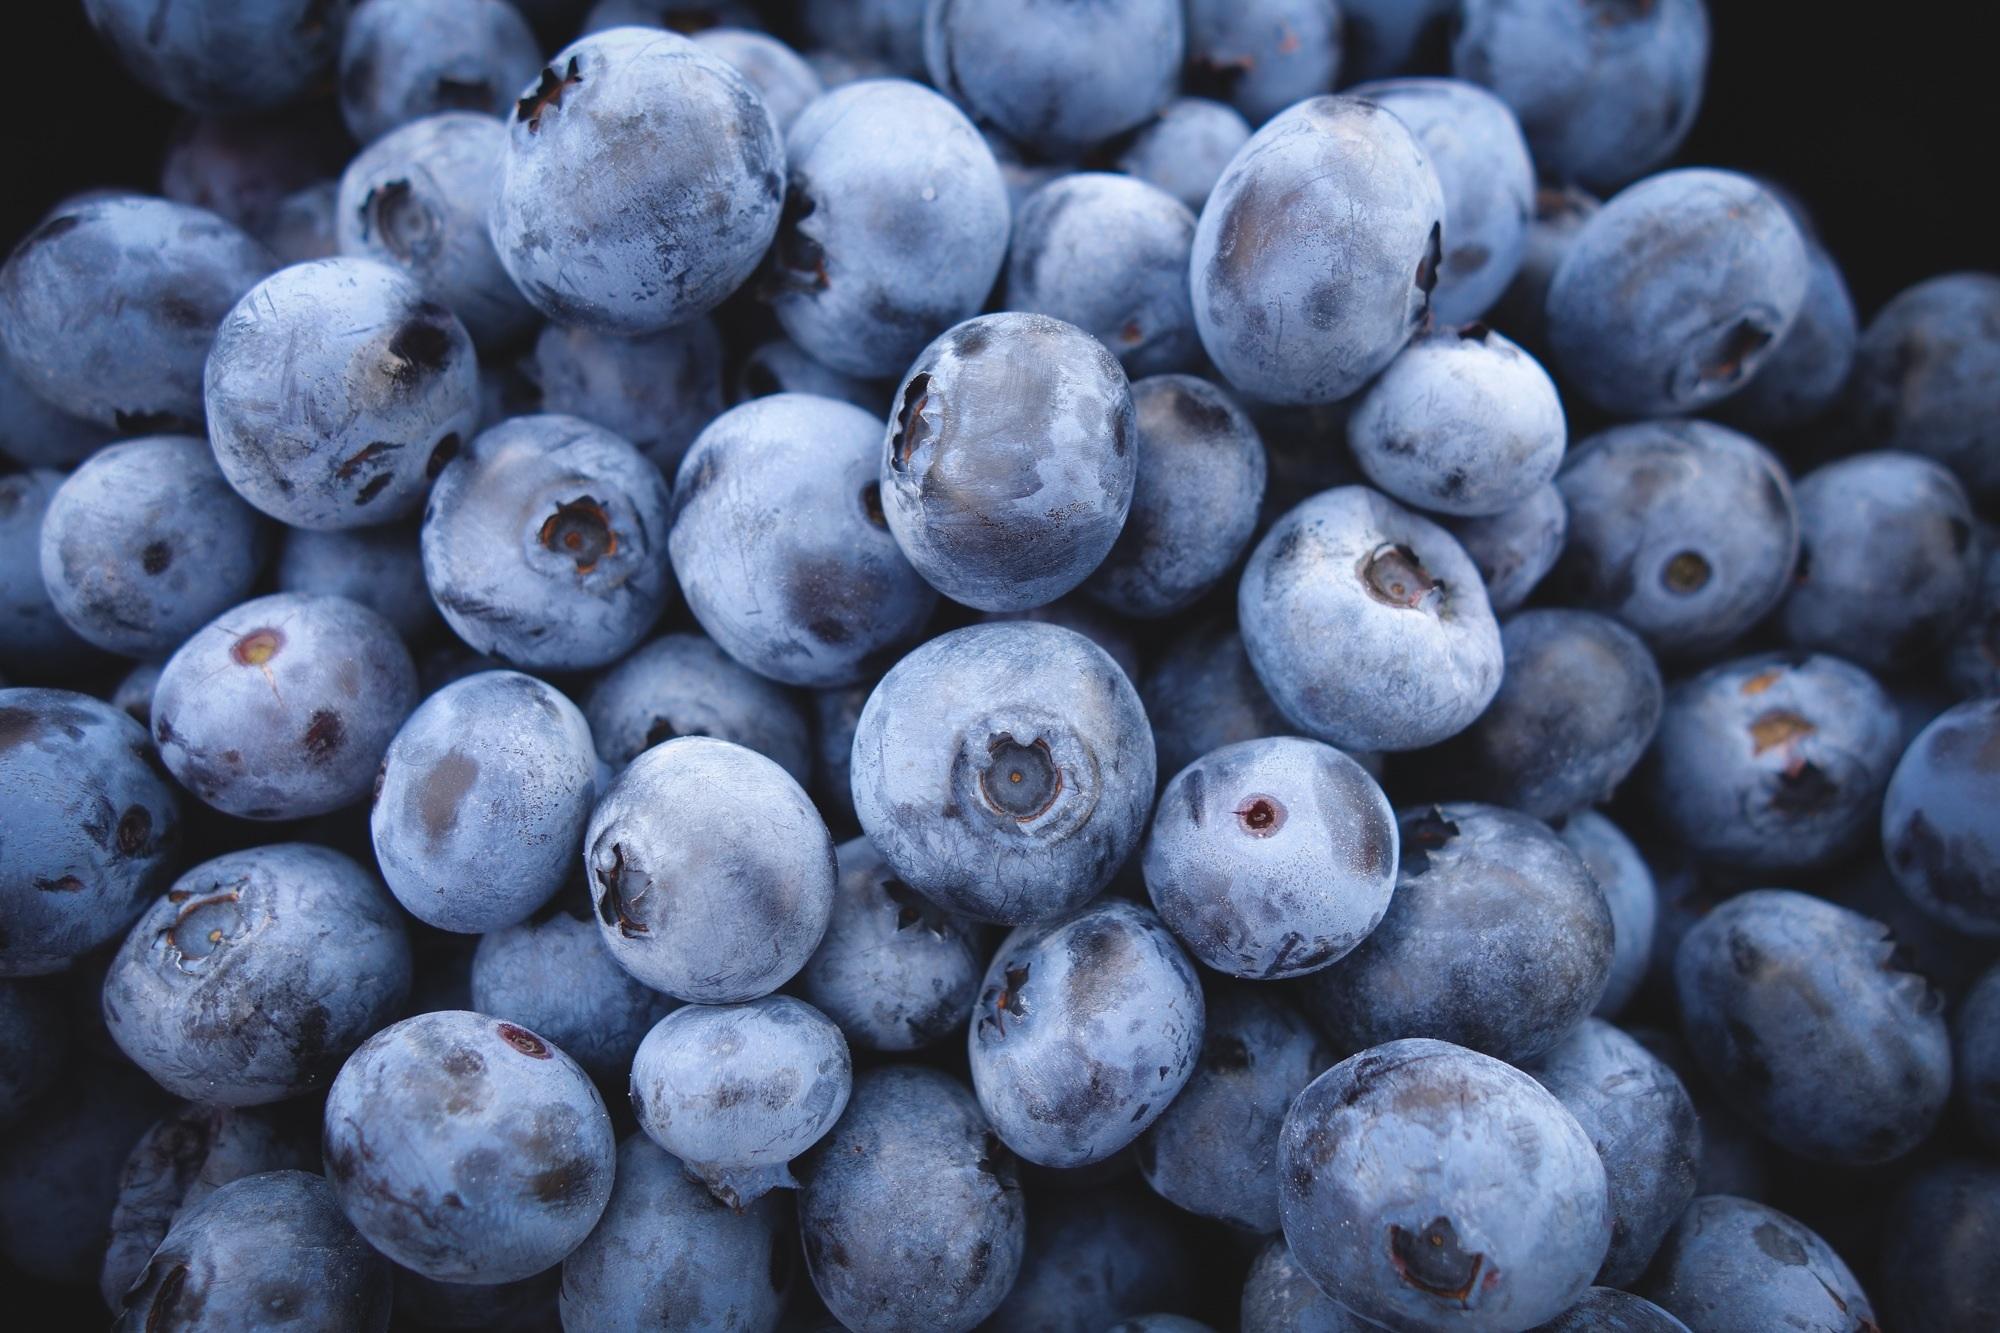 blueberries-690072.jpg